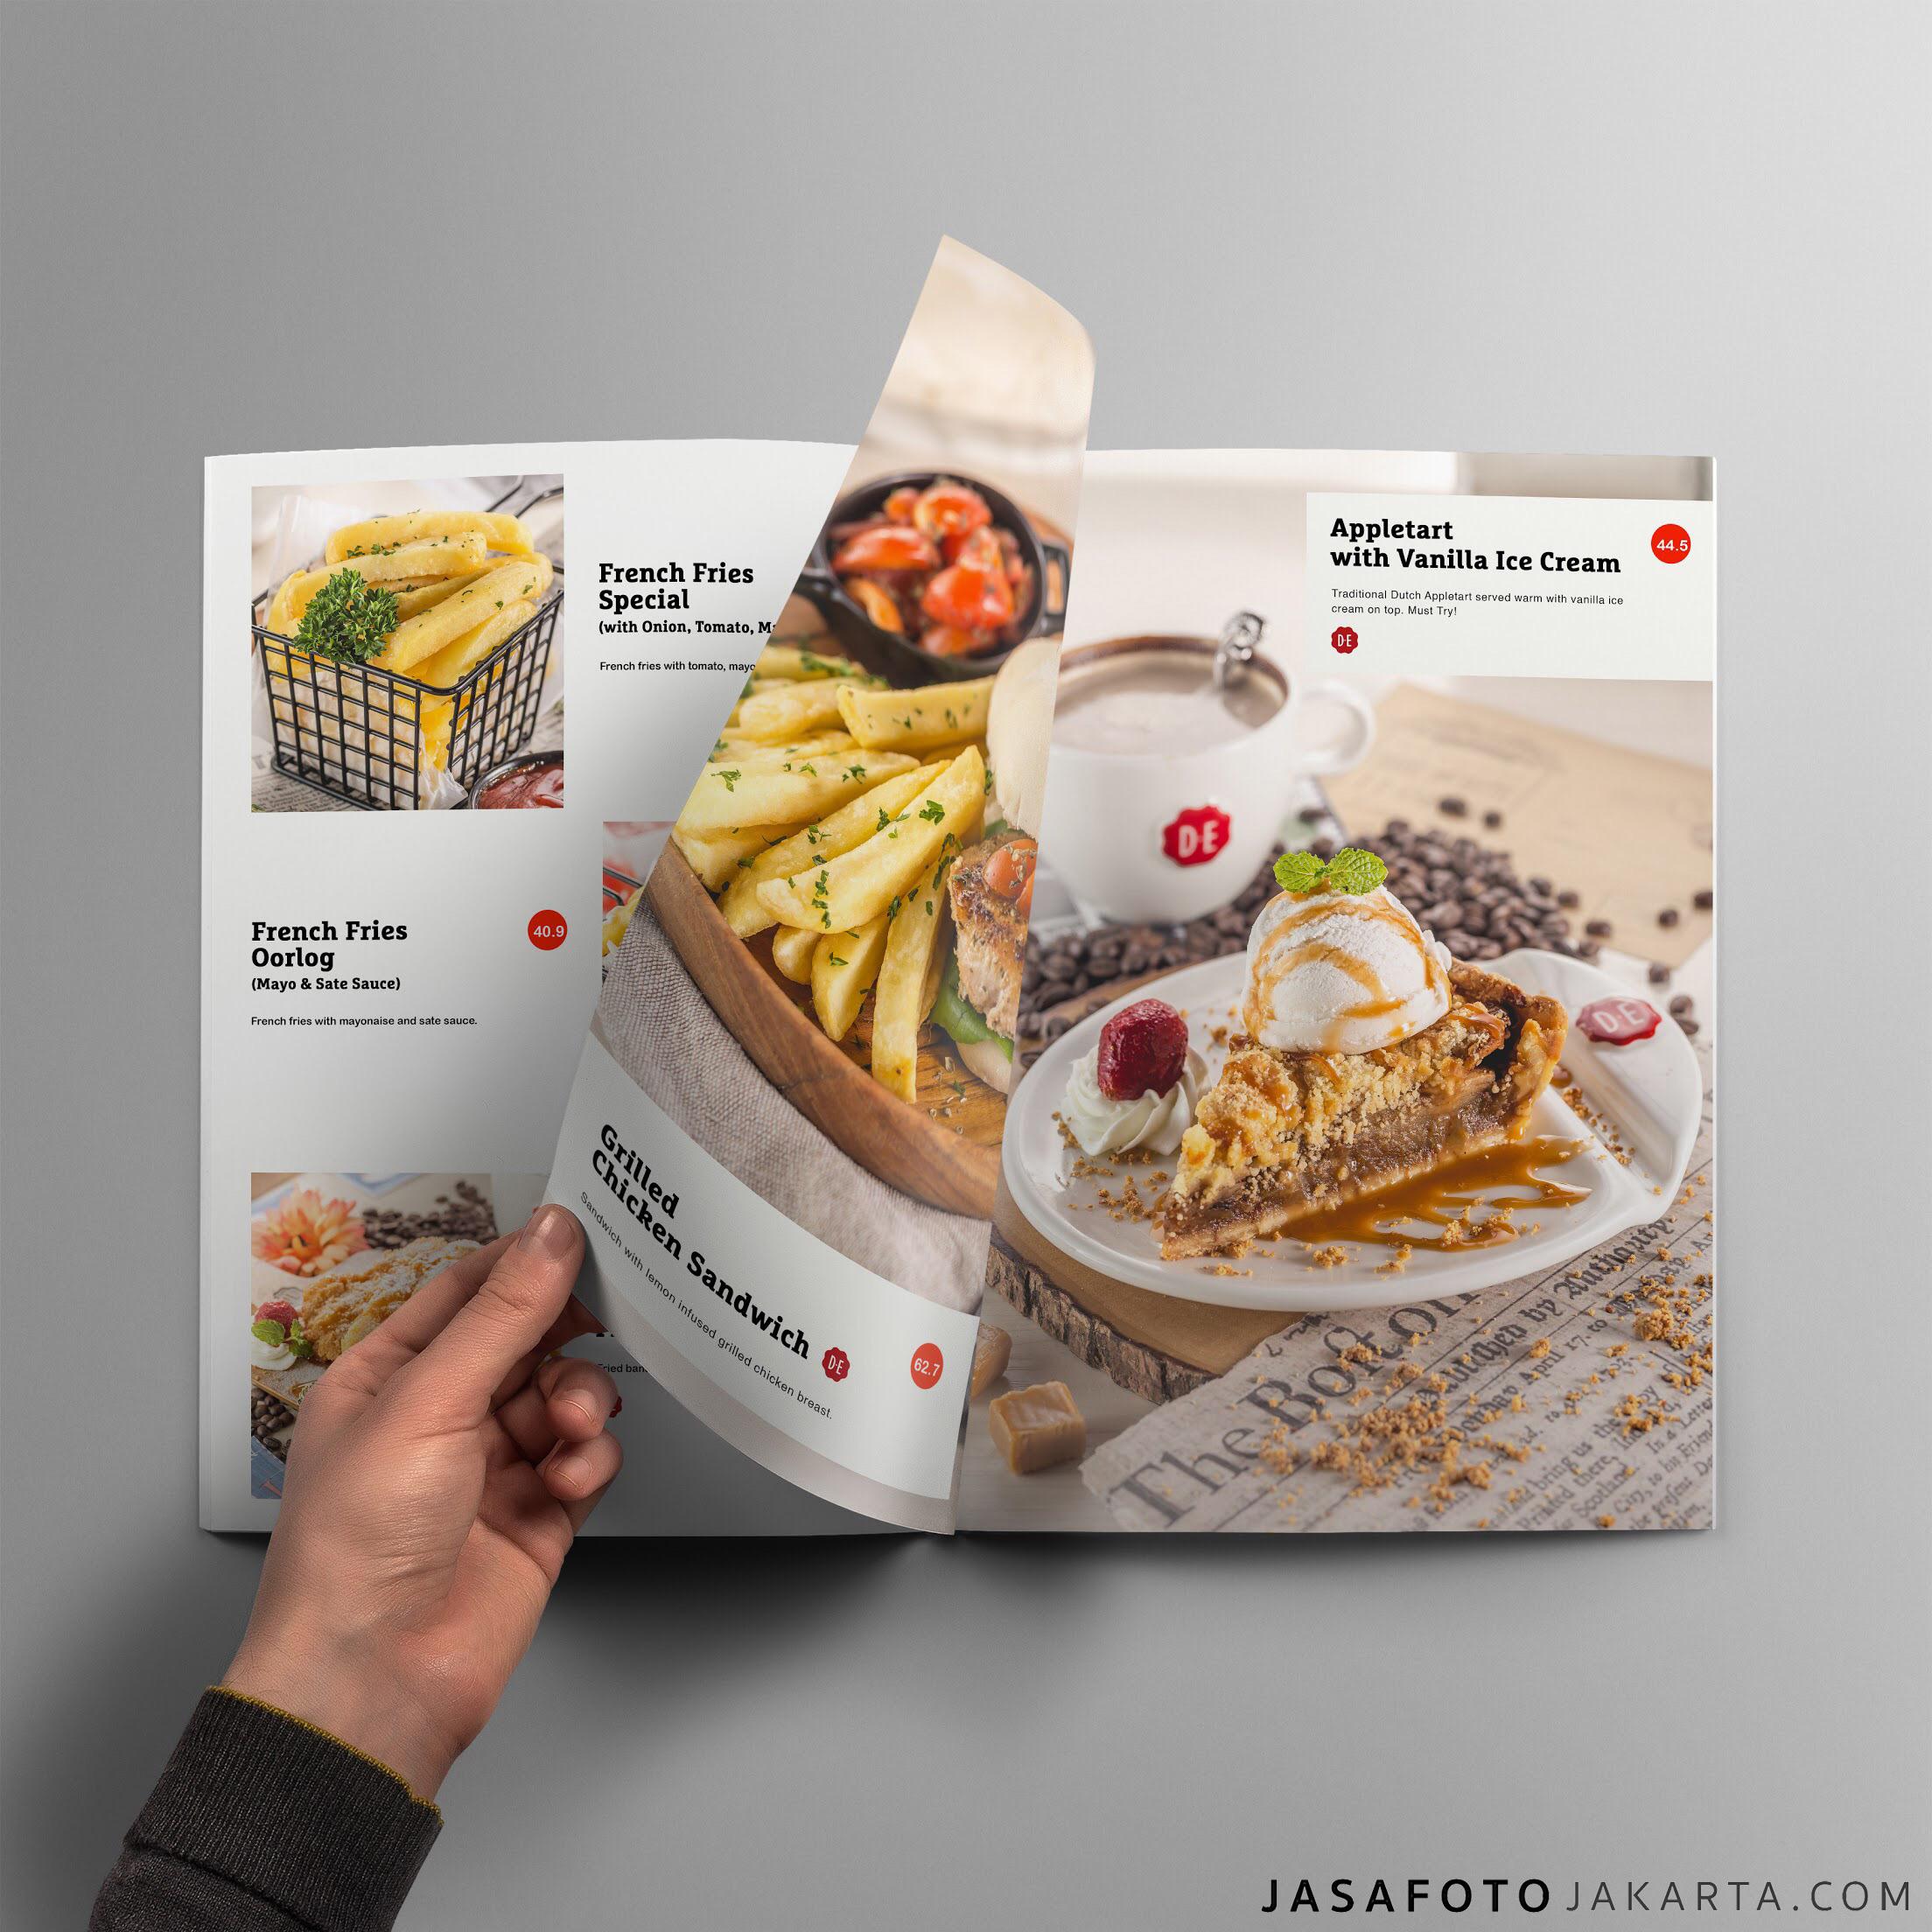 Harga Jasa Desain Interior Cafe: Jasa Fotografi Di Jakarta